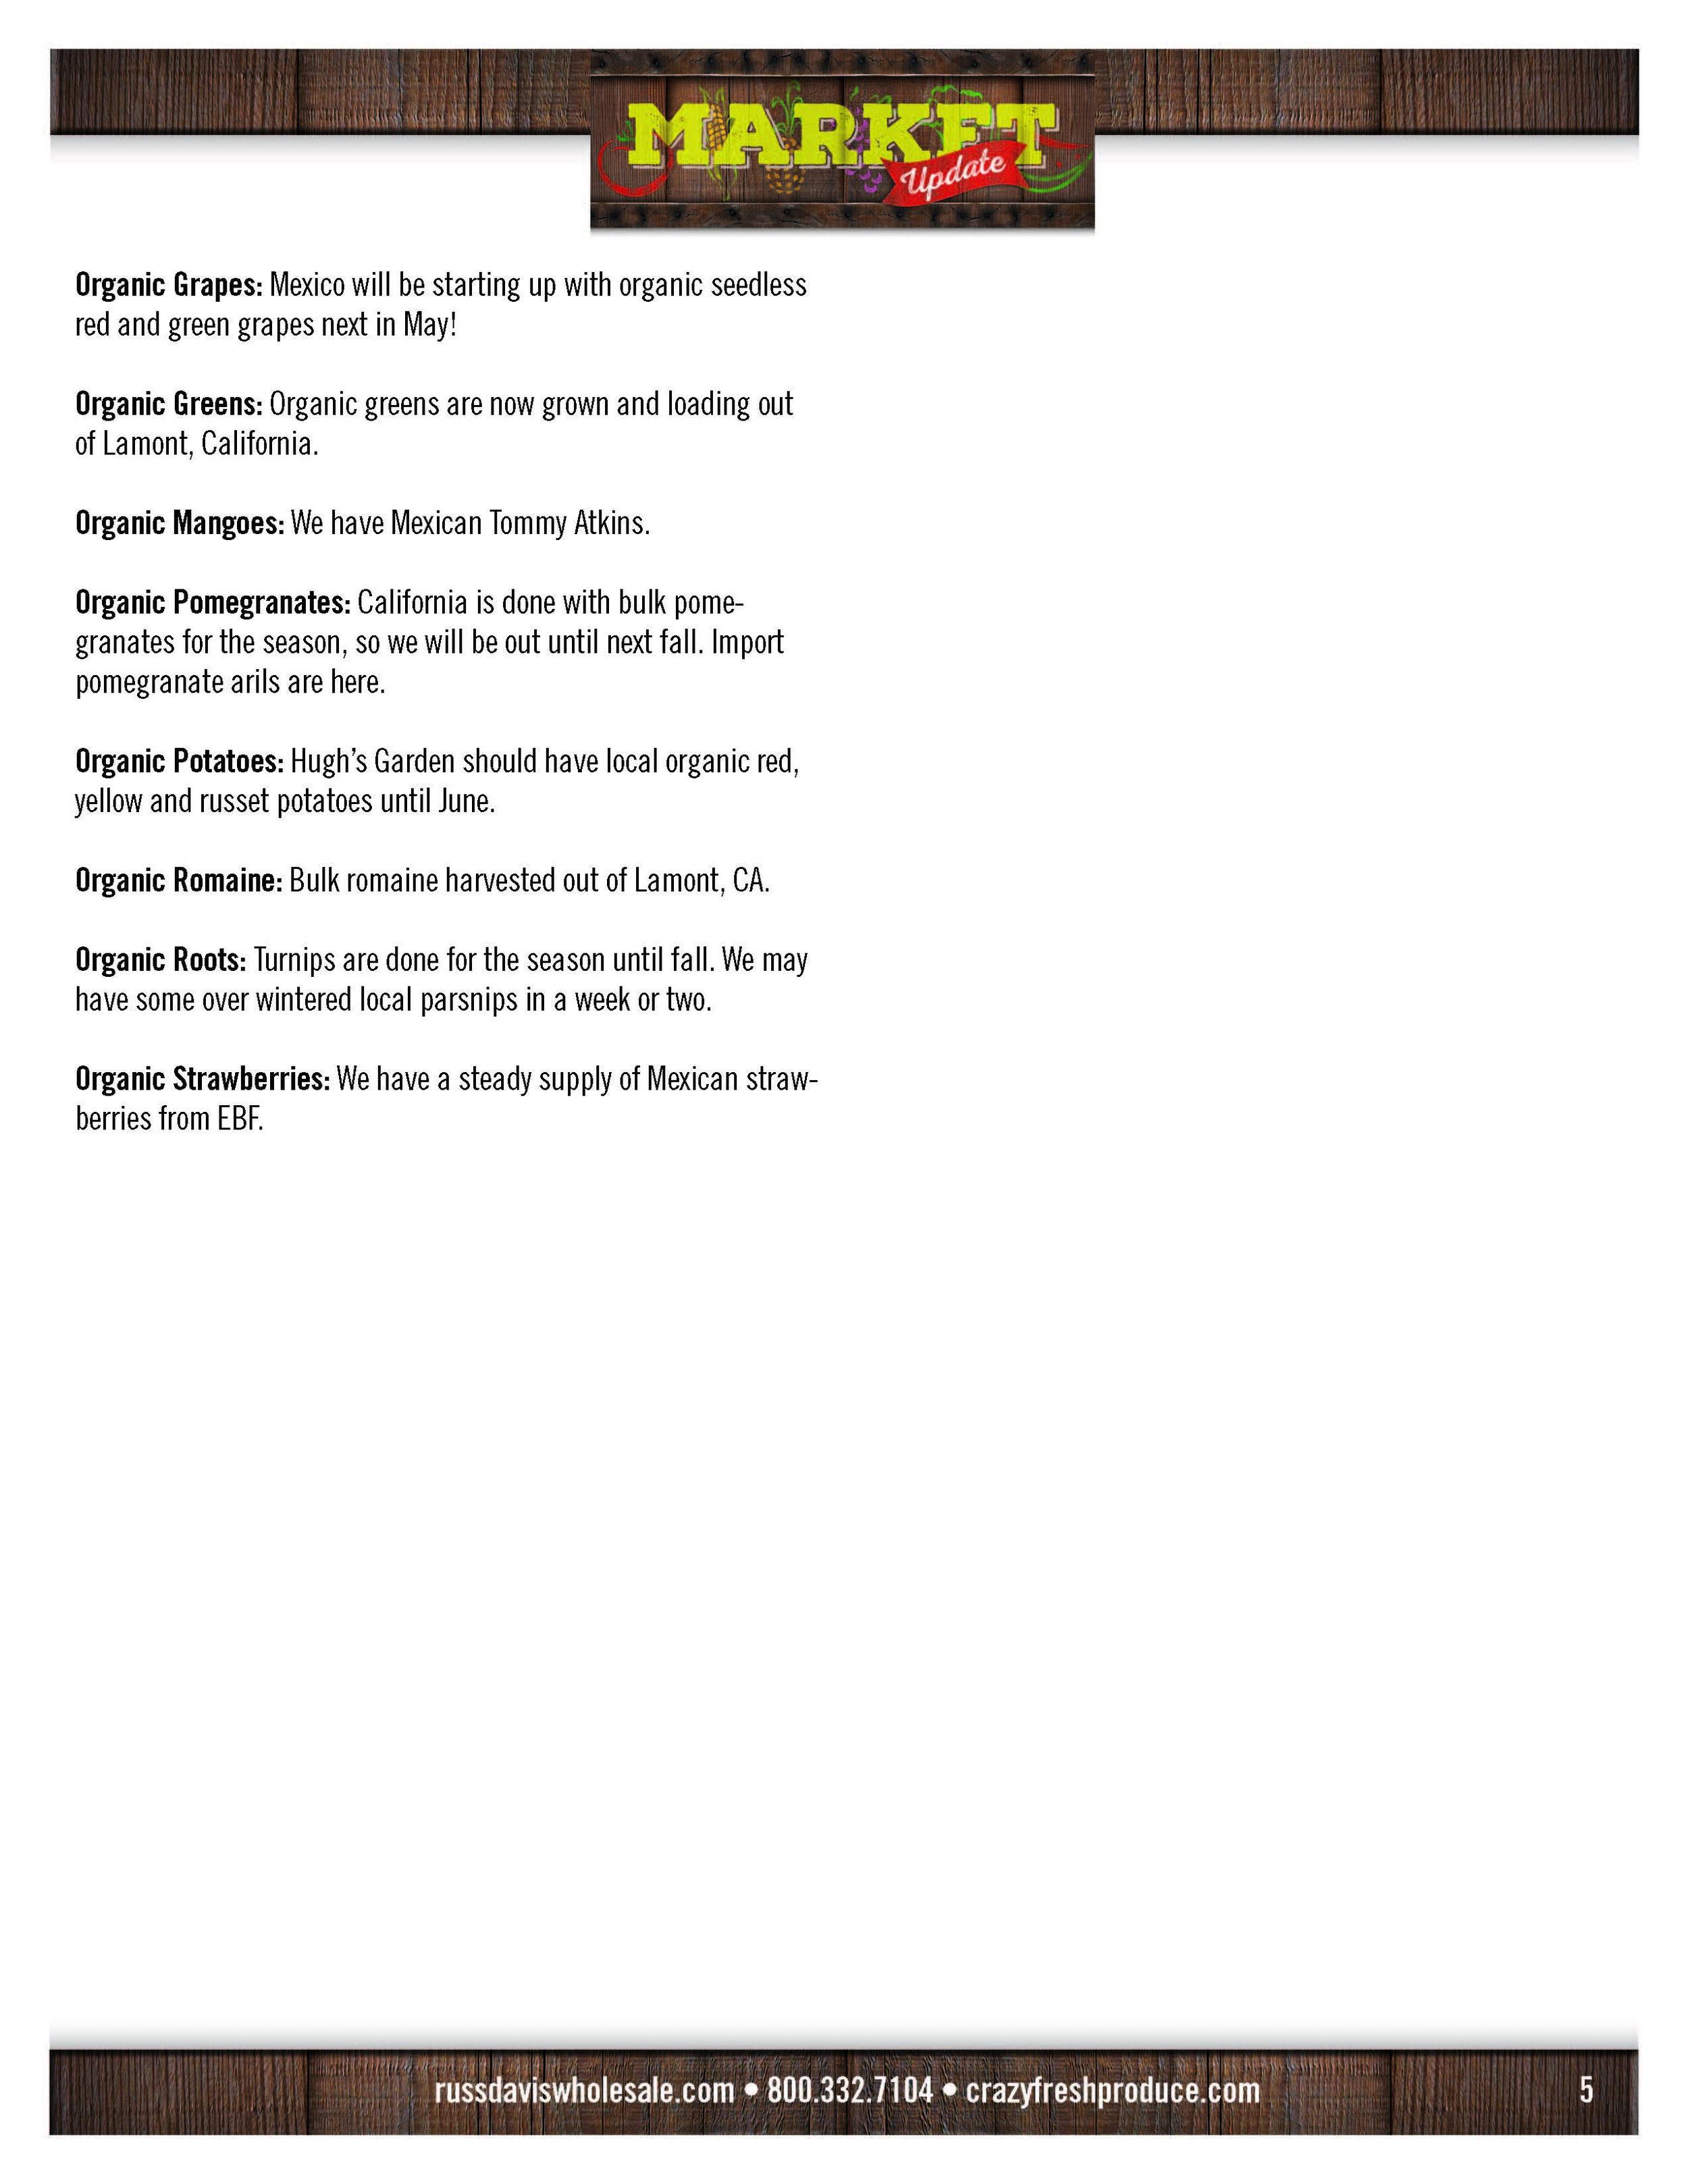 RDW_Market_Update_Apr25_19_Page_5.jpg